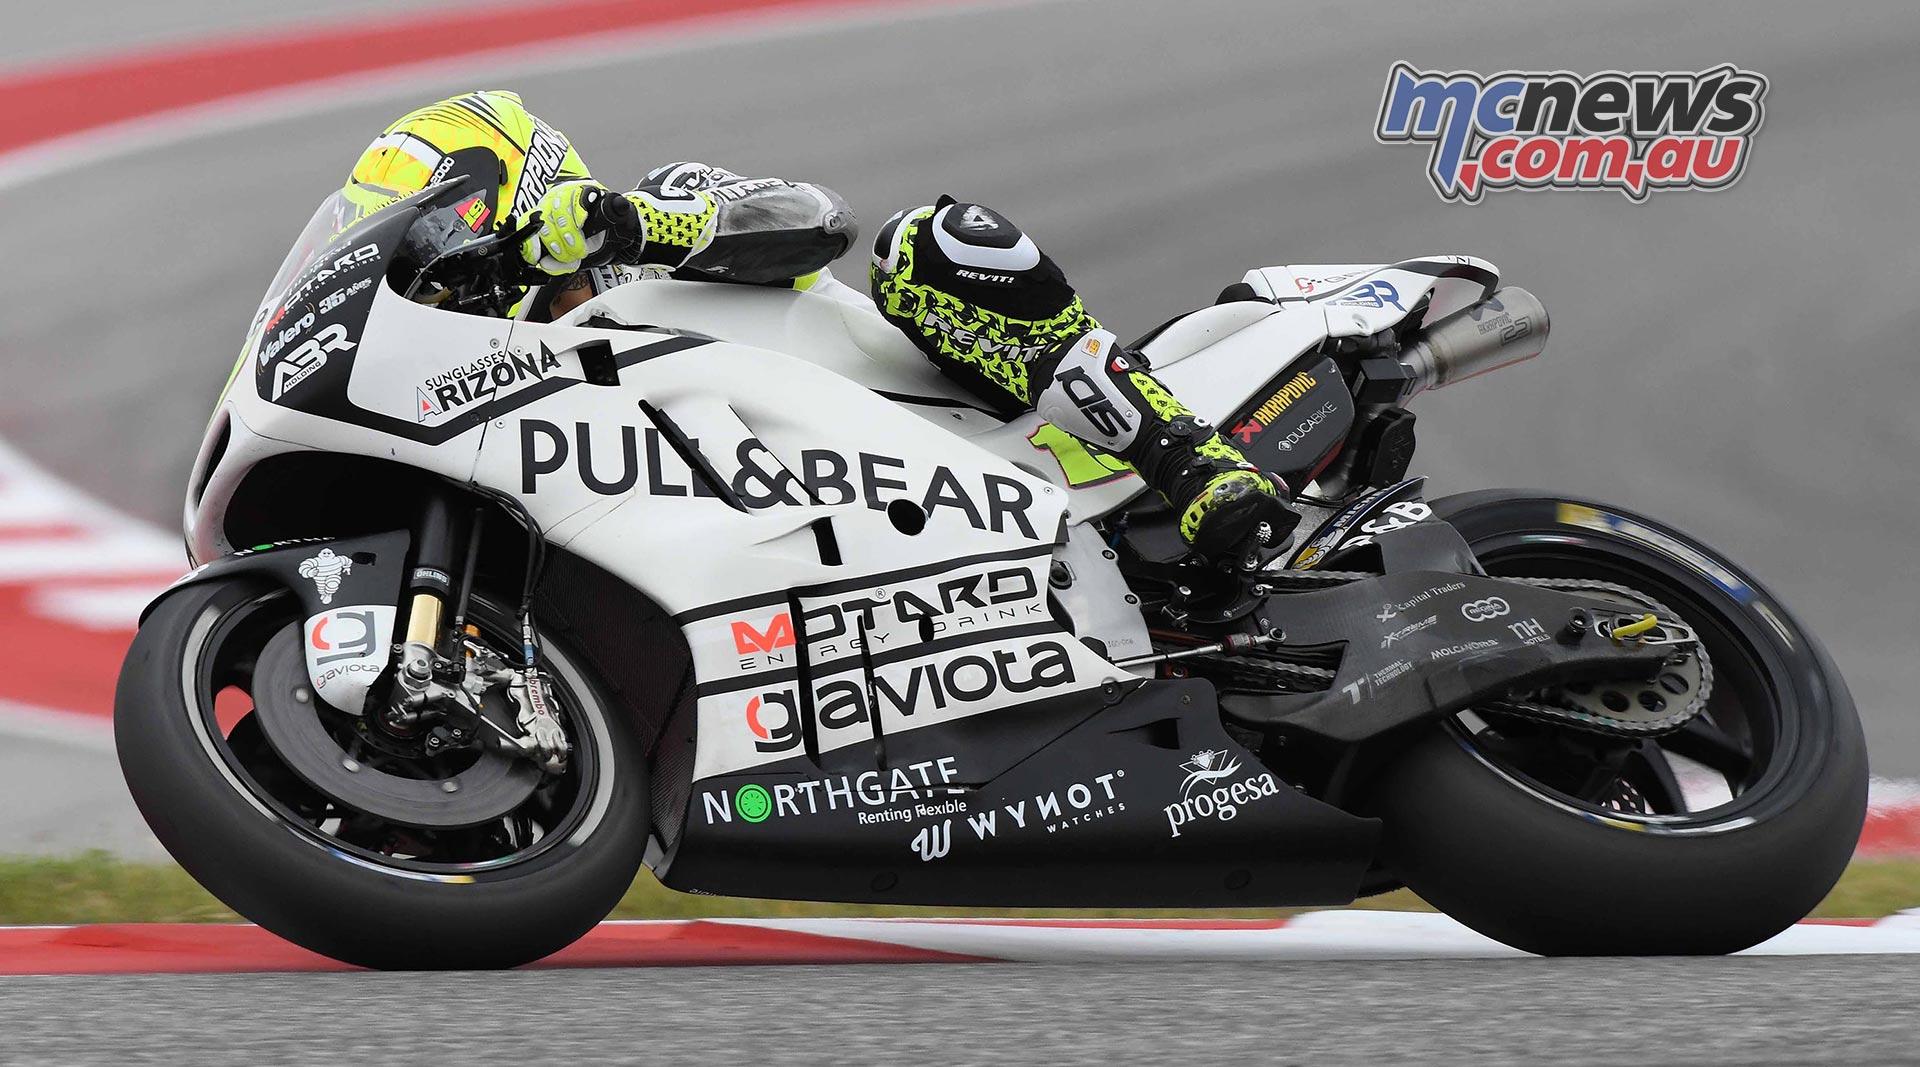 Massive MotoGP Qualifying wrap from COTA   MCNews.com.au